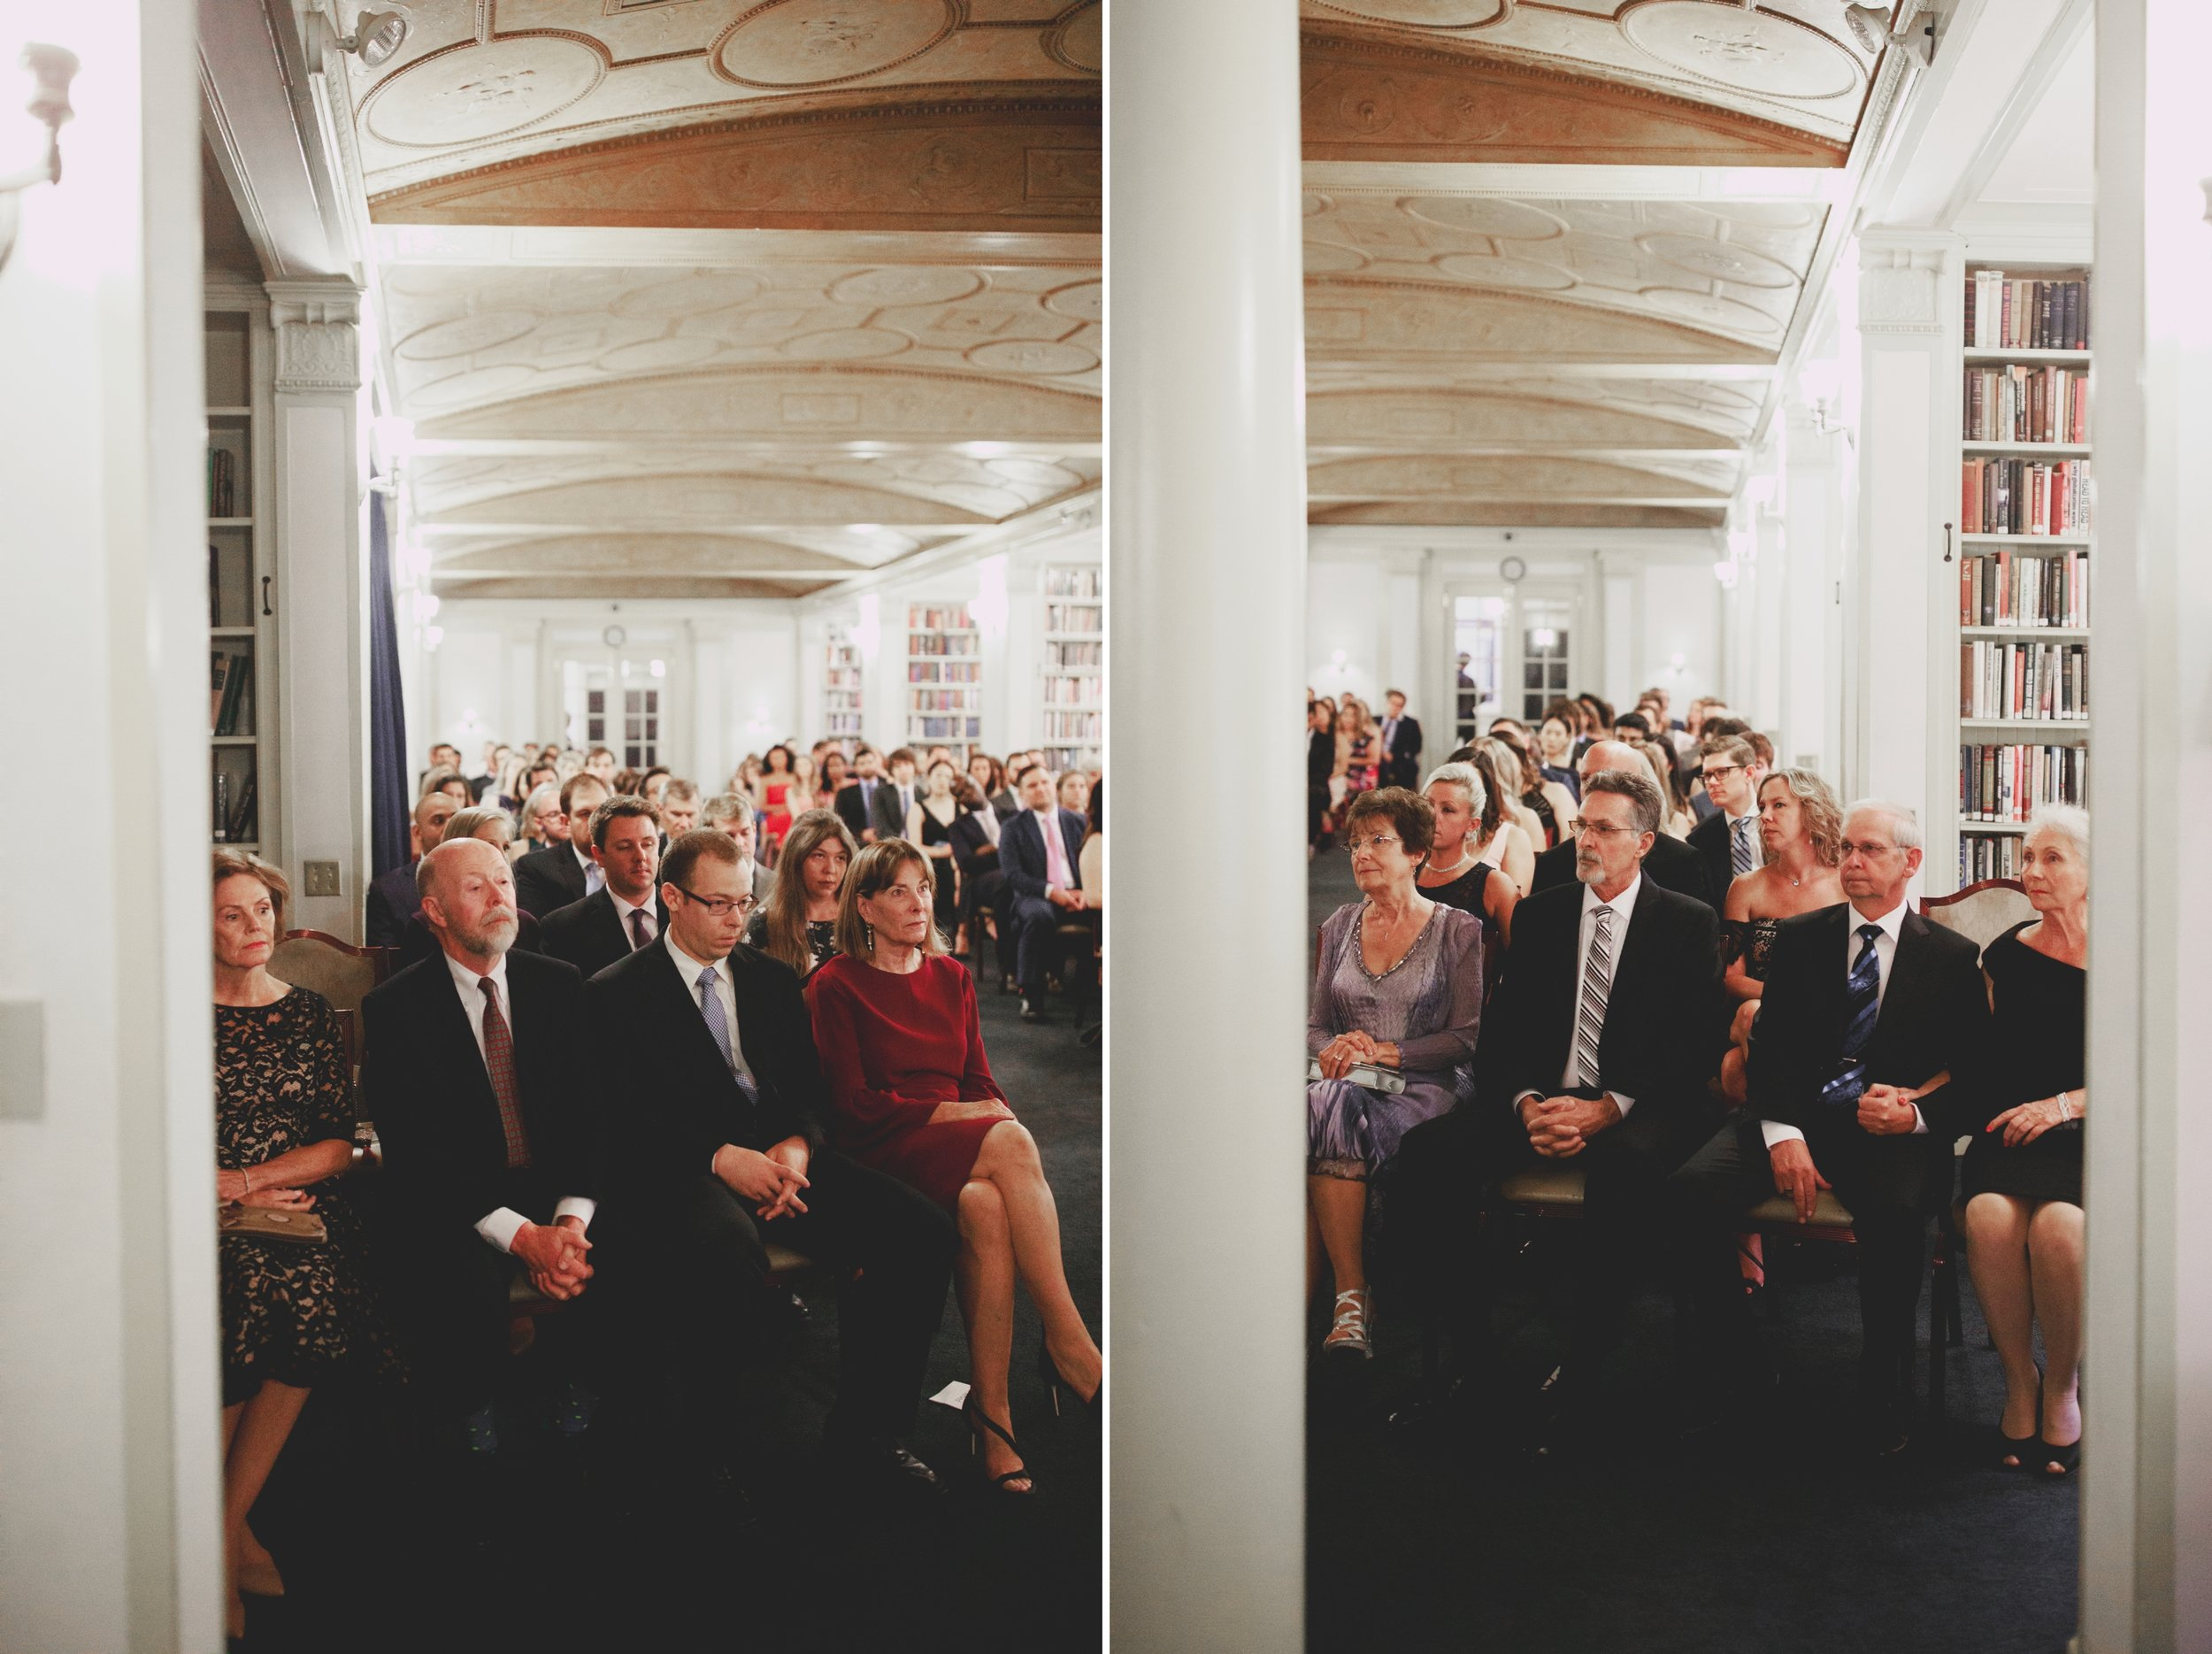 amanda_vanvels_new_york_lgbtq_gay_wedding_058.jpg